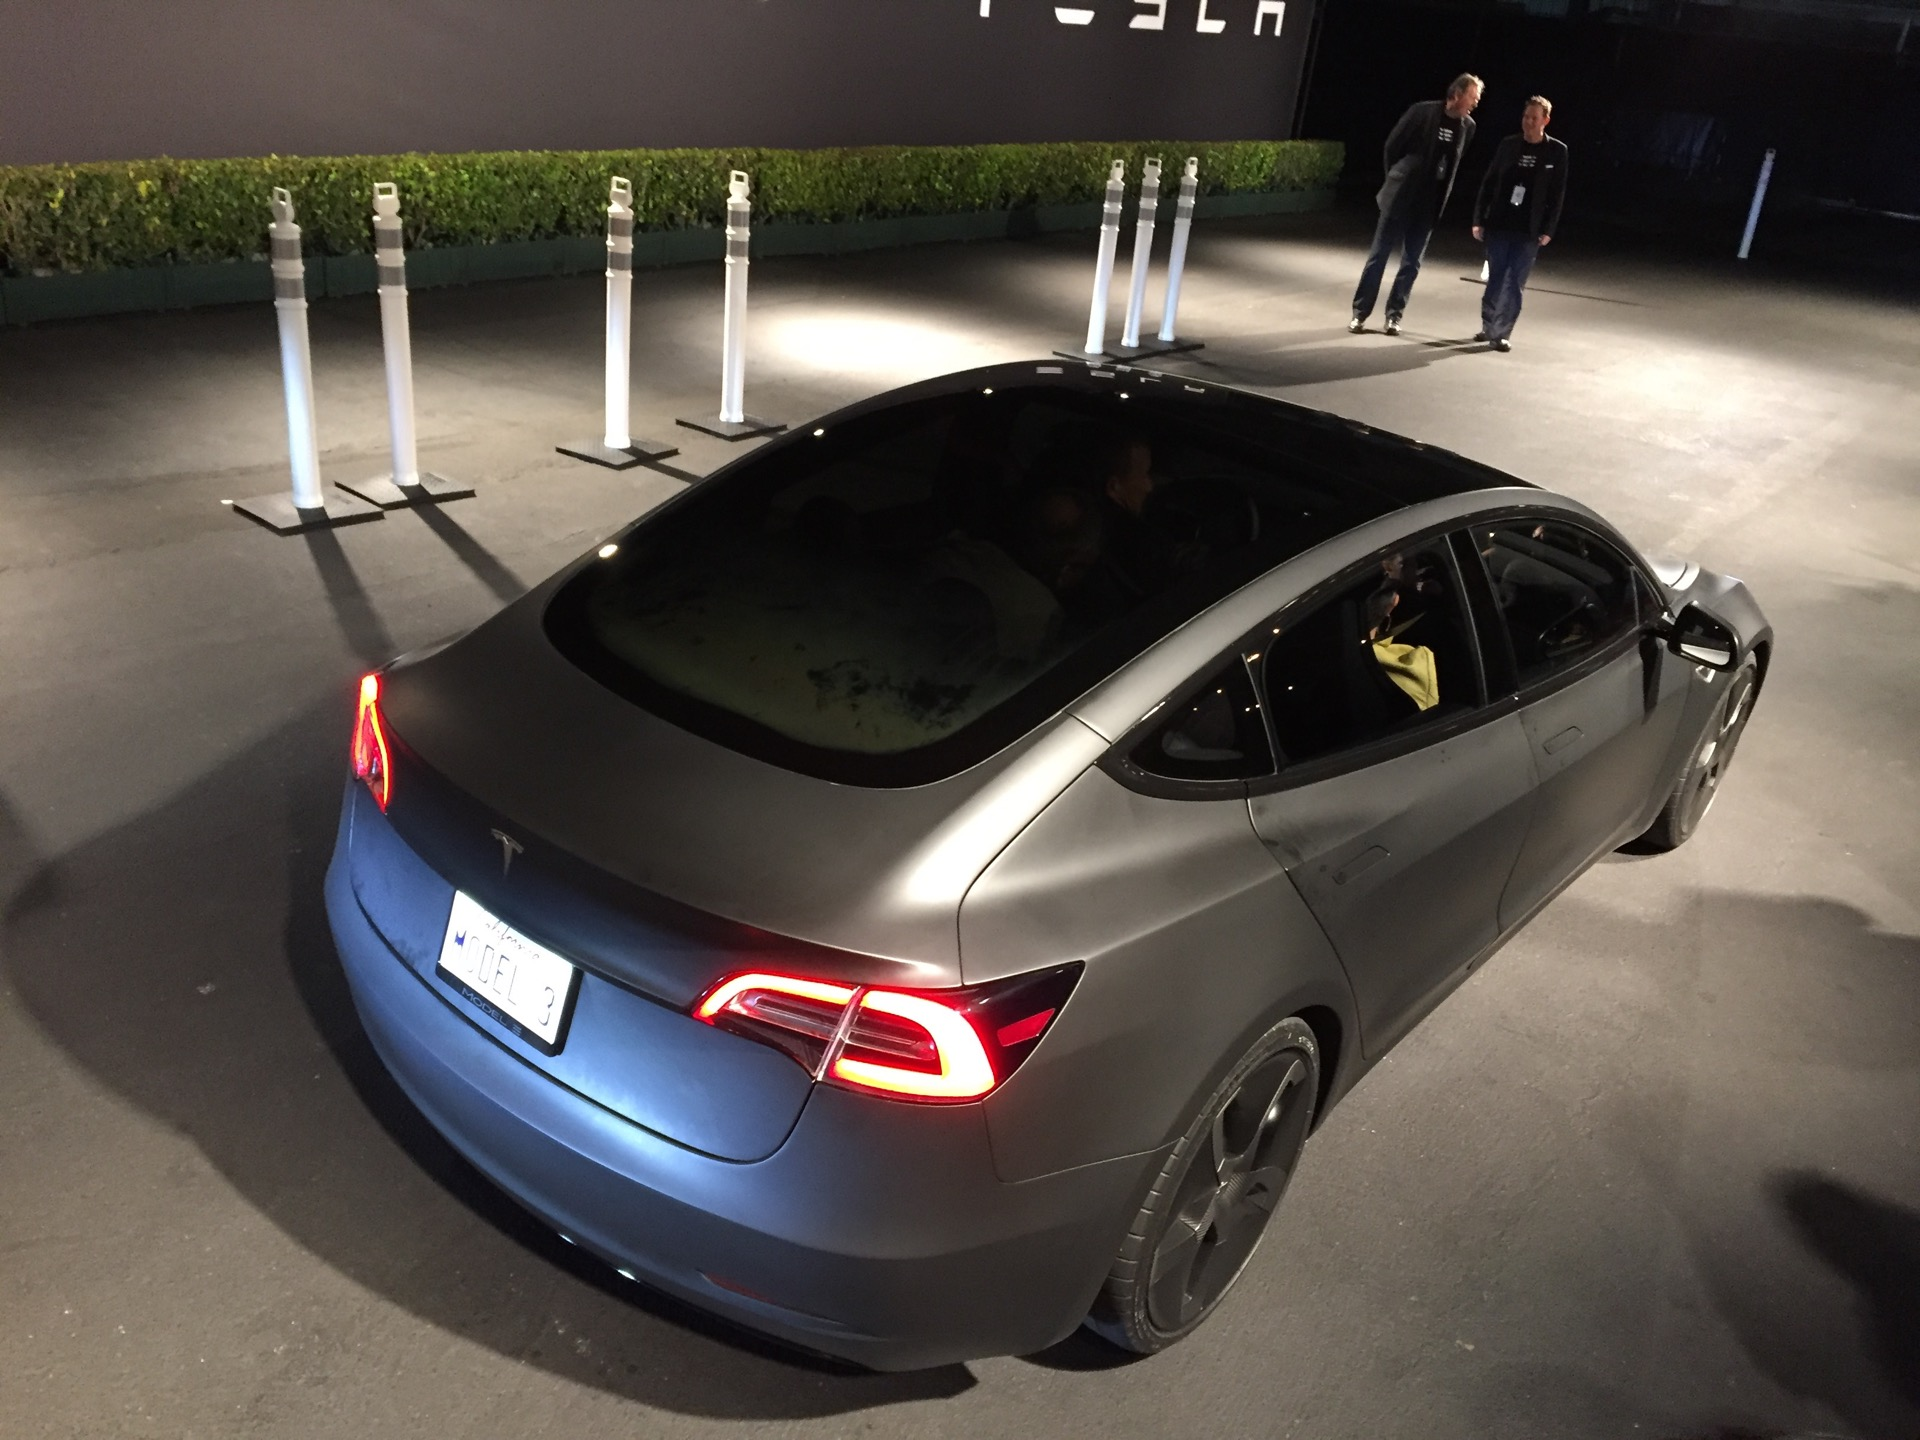 Design of tesla car - Design Of Tesla Car 75